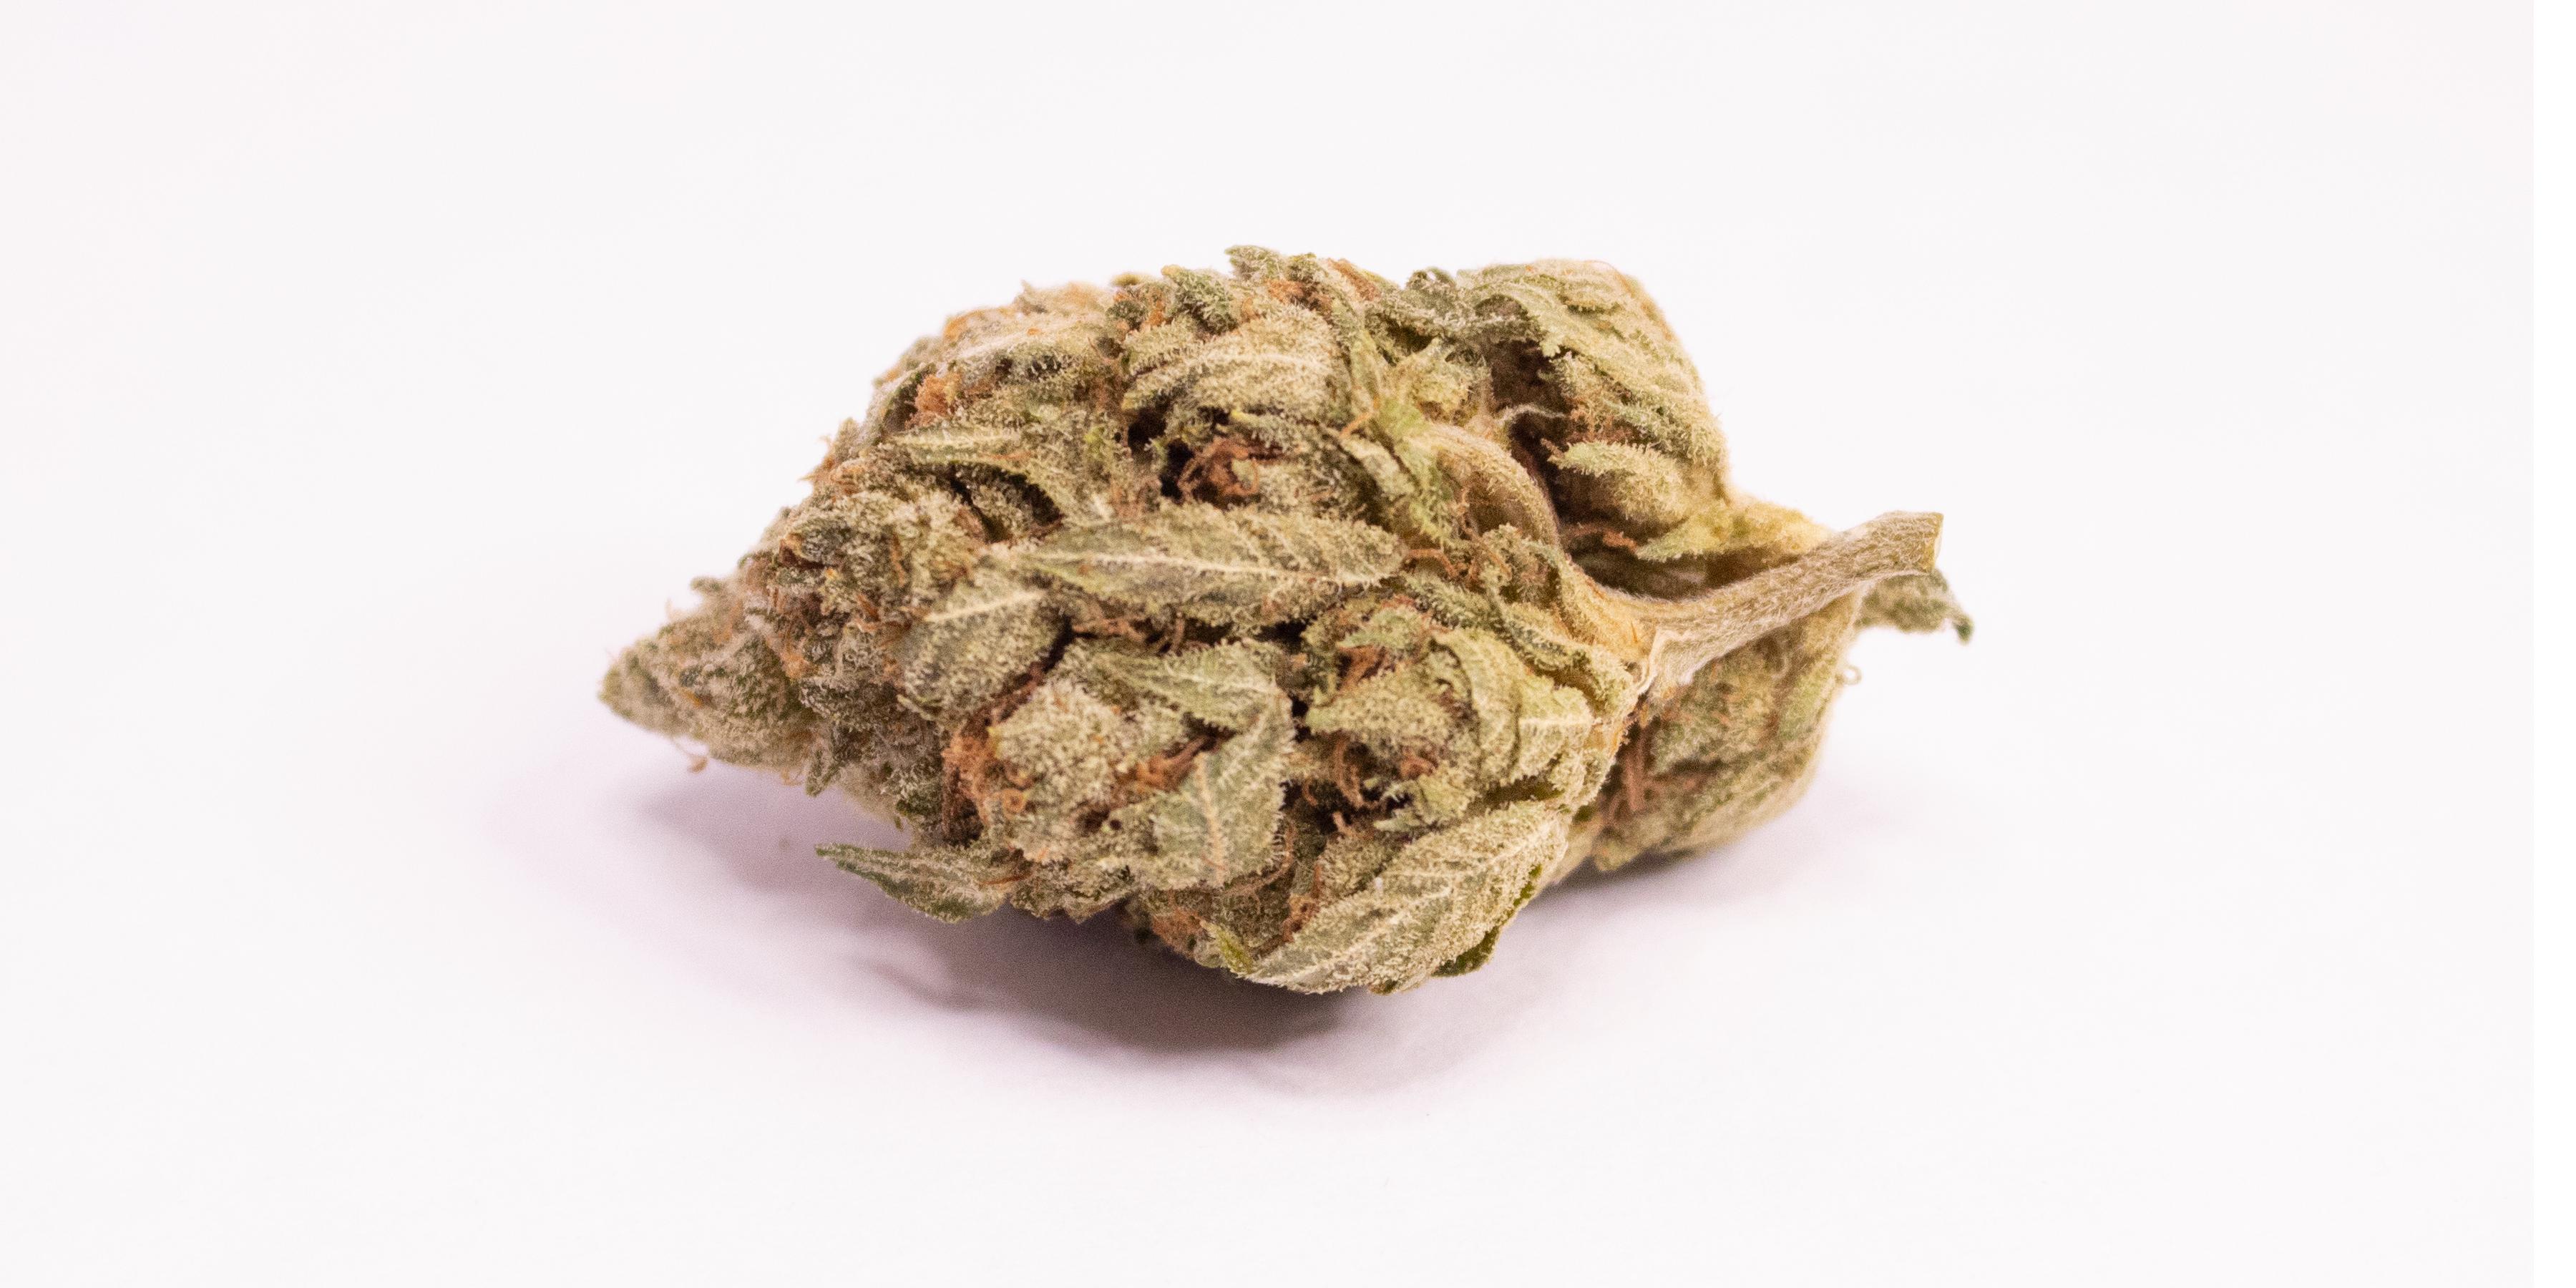 Online Dispensary Canada - Granddaddy Purple Single